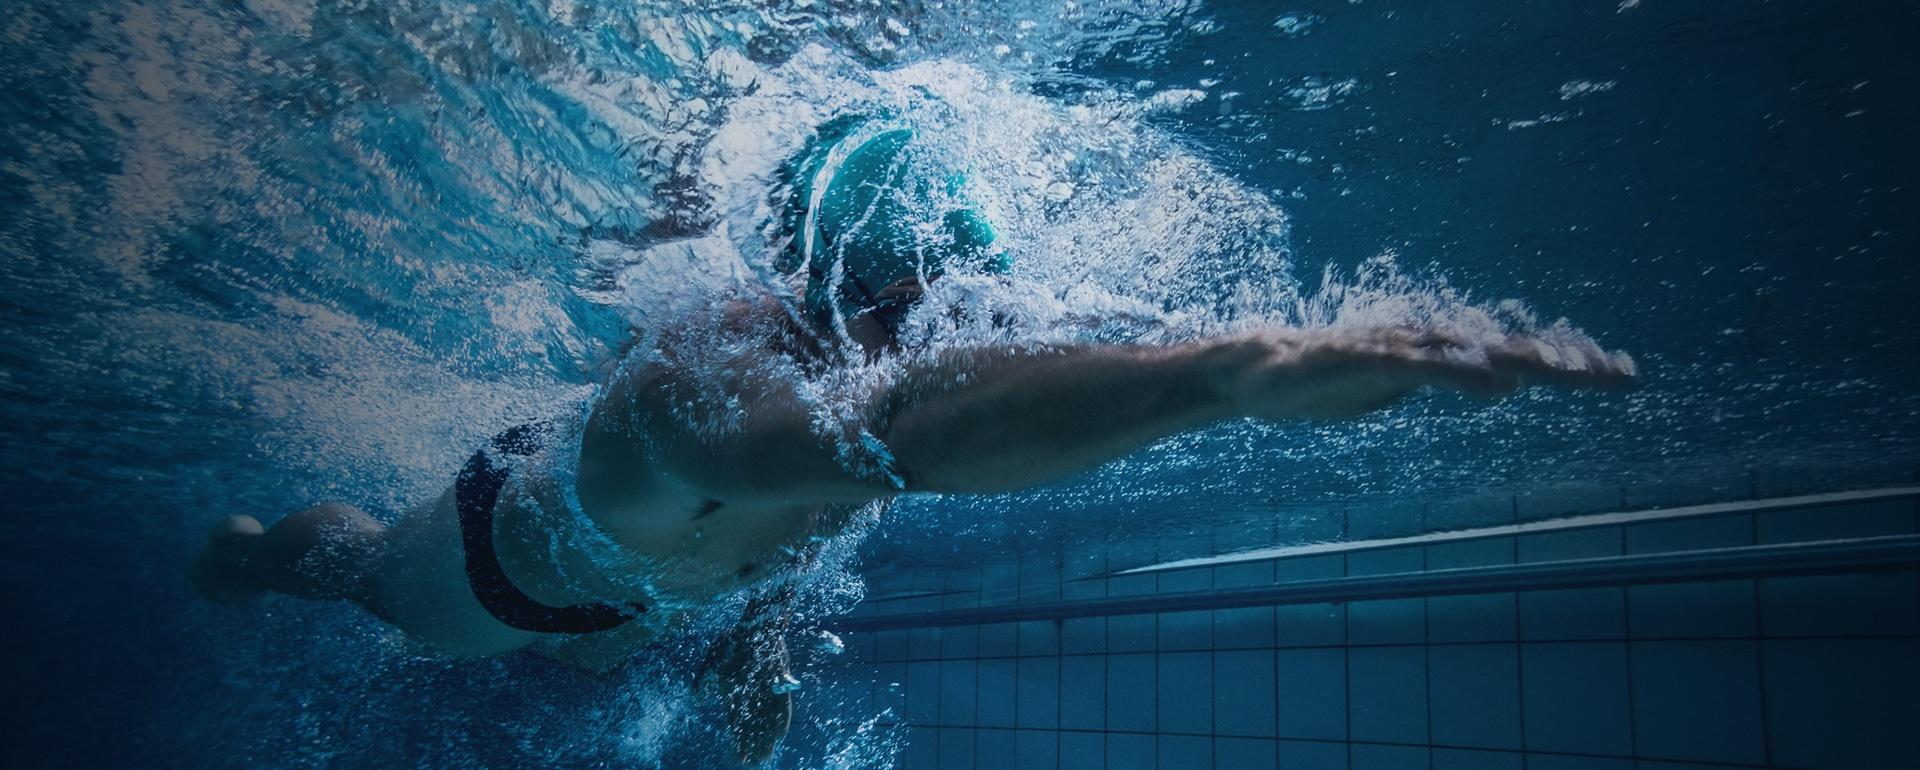 background-swimming